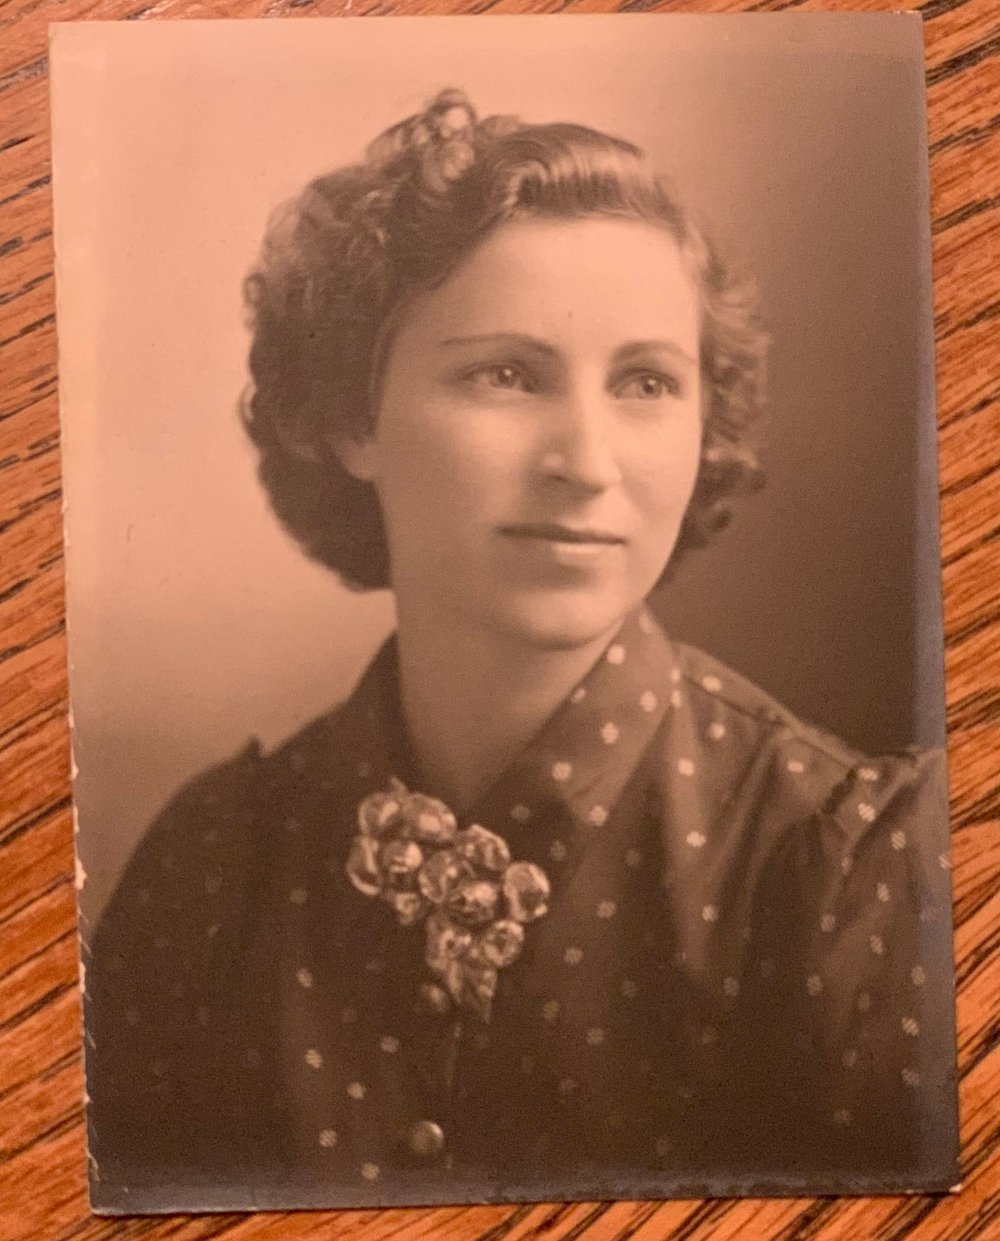 A photo of my grandma, Doris, taken after her high school graduation